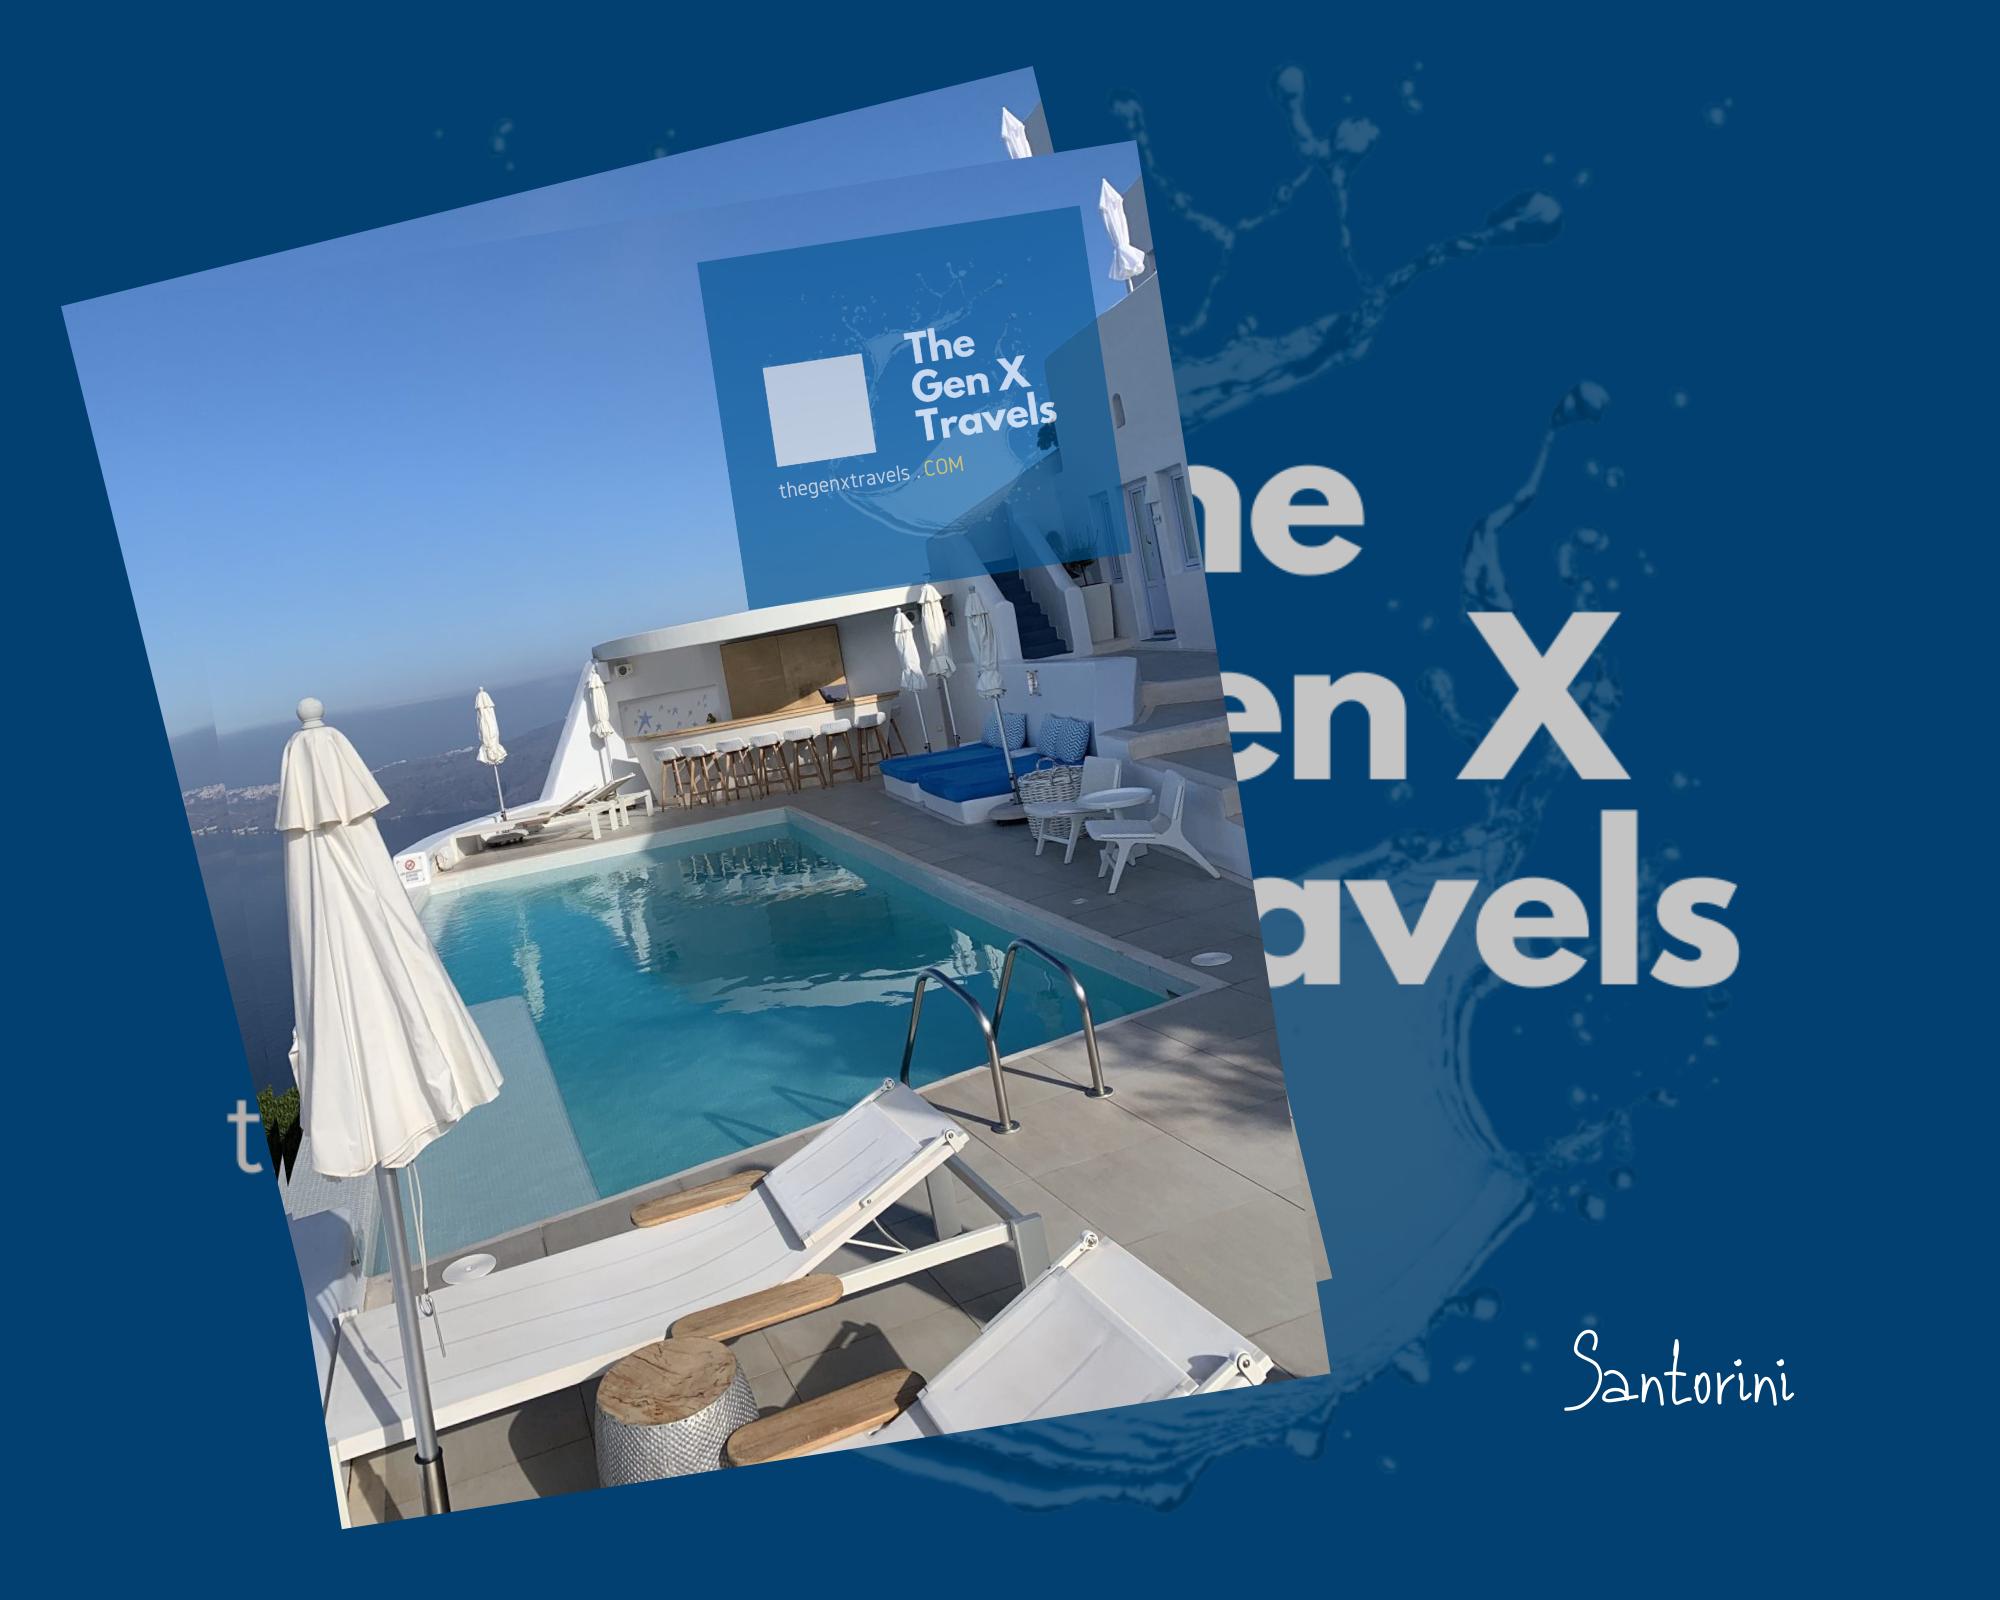 The Gen X Travels to : Santorini